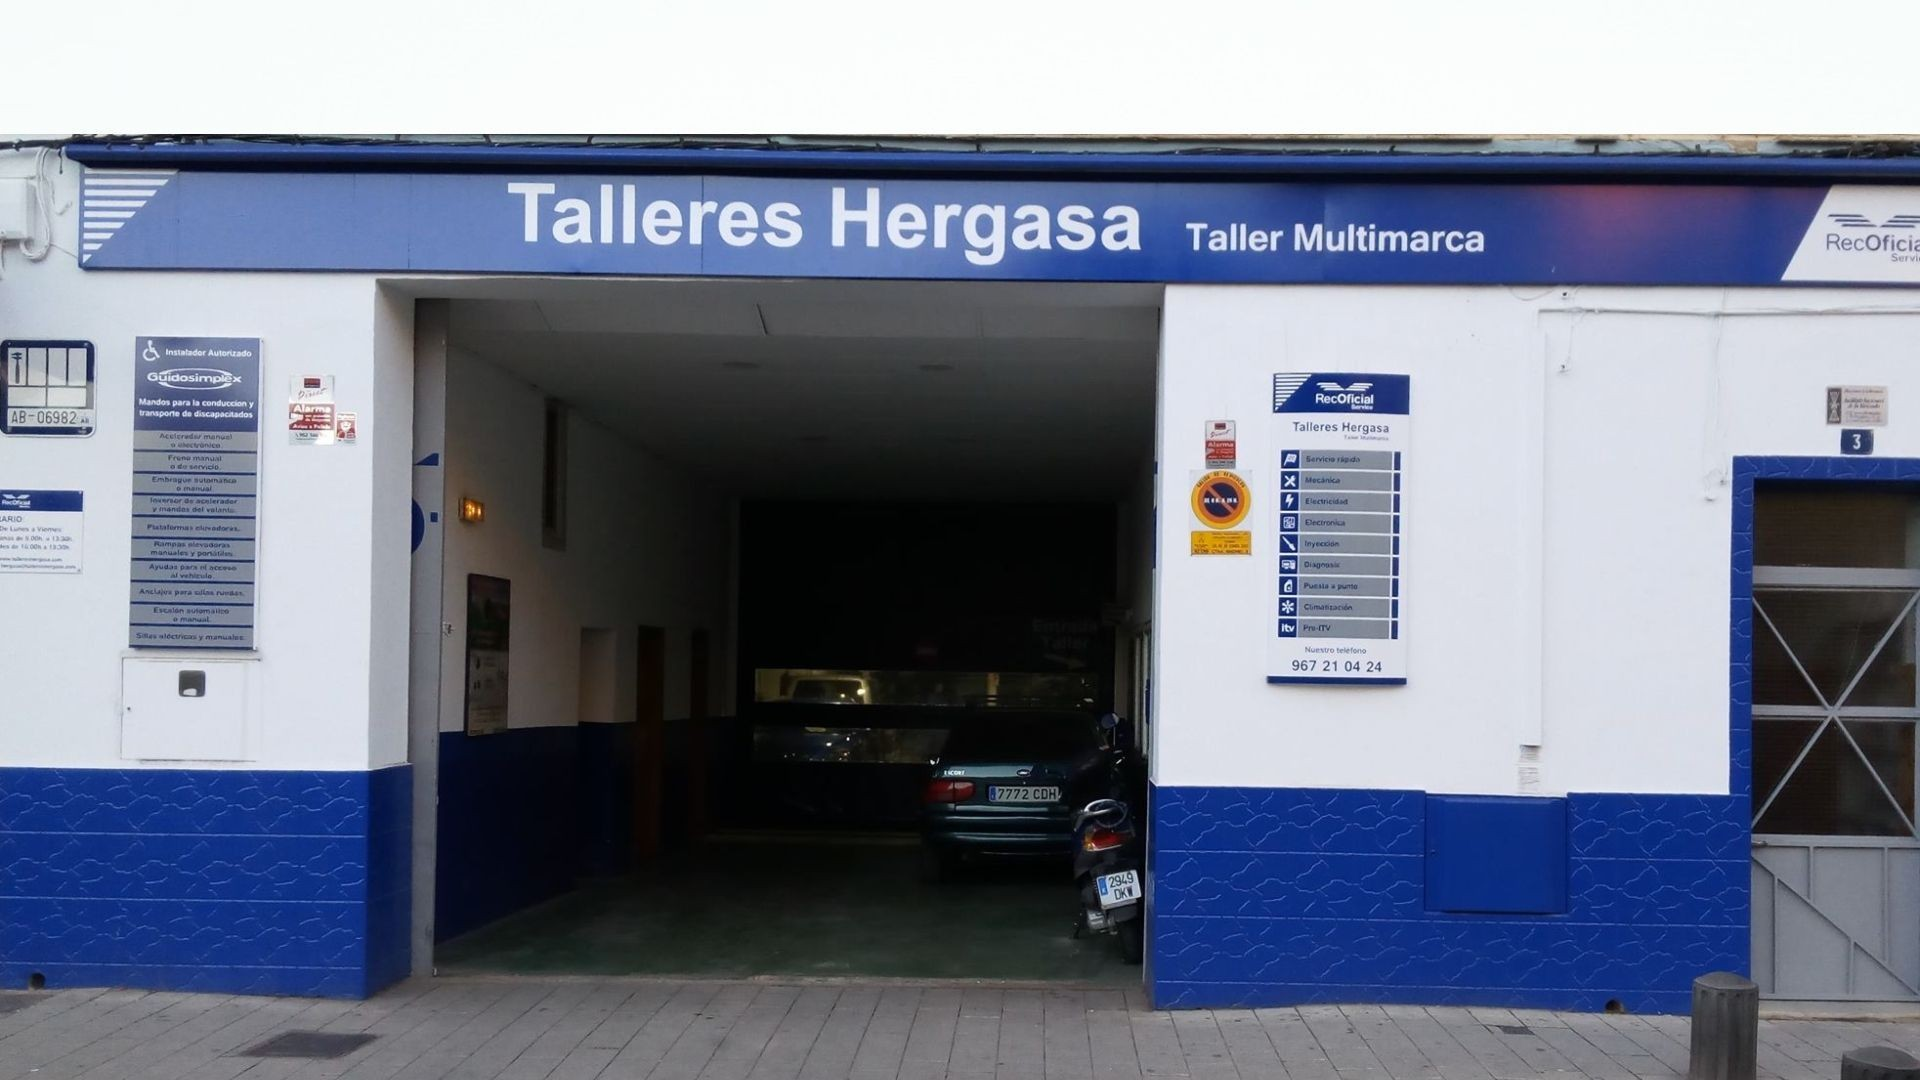 Talleres Hergasa